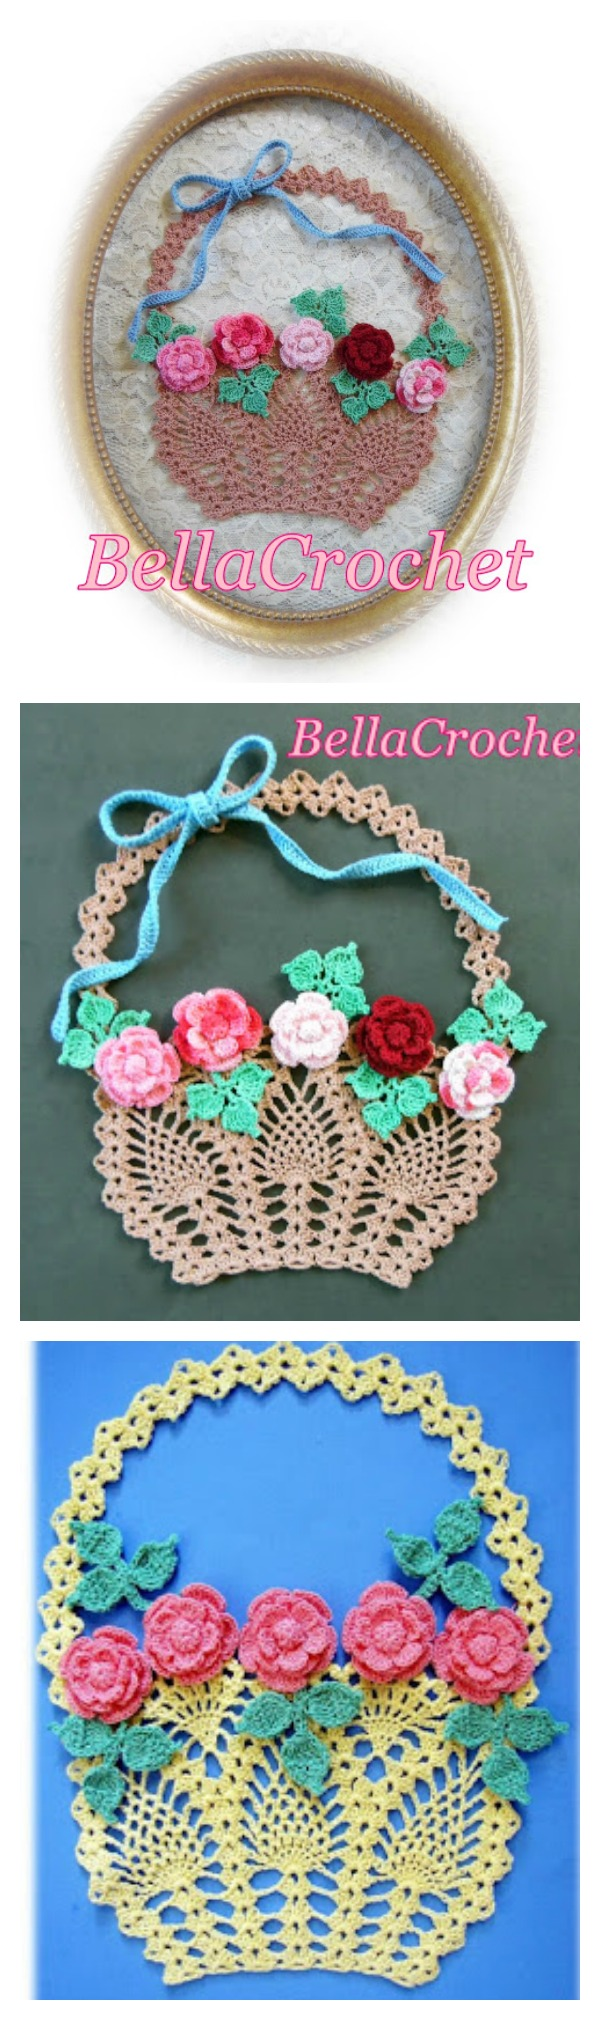 Crochet Flower Basket Of Roses Wall Art Free Pattern Cool Creativities